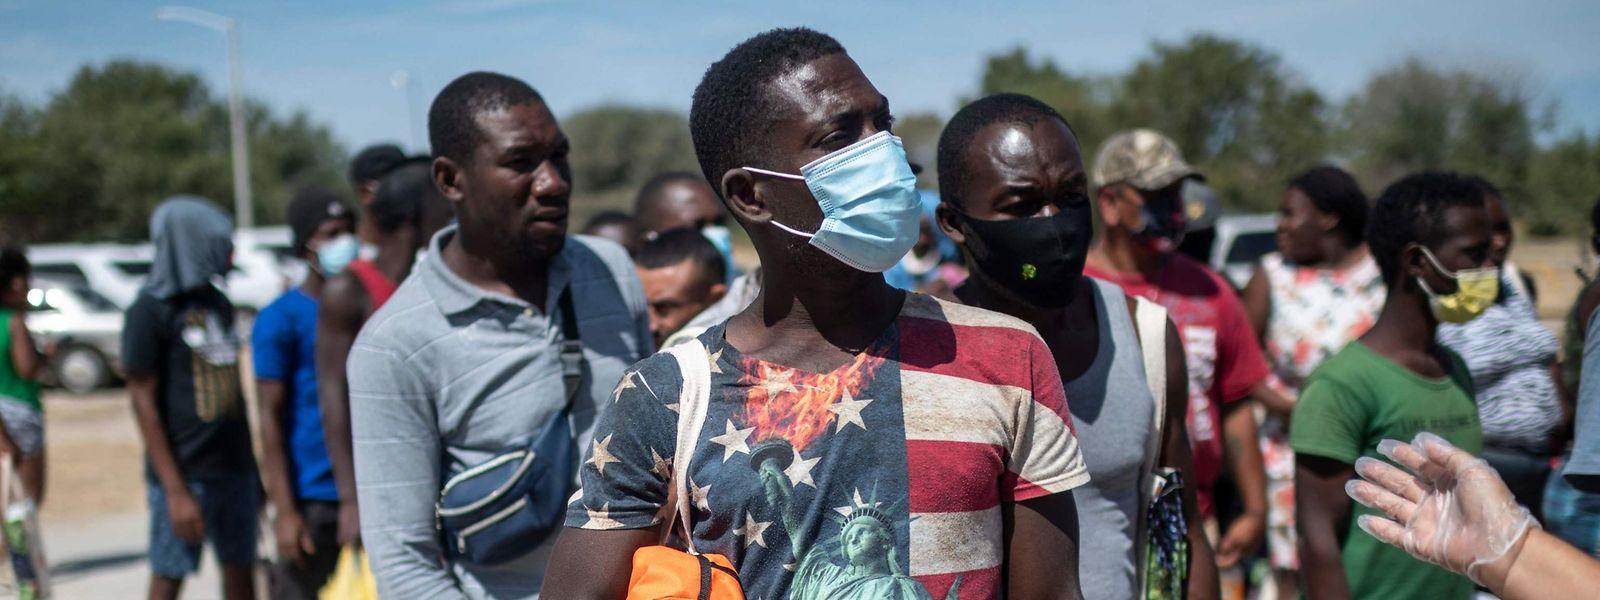 Migrantes do Haiti